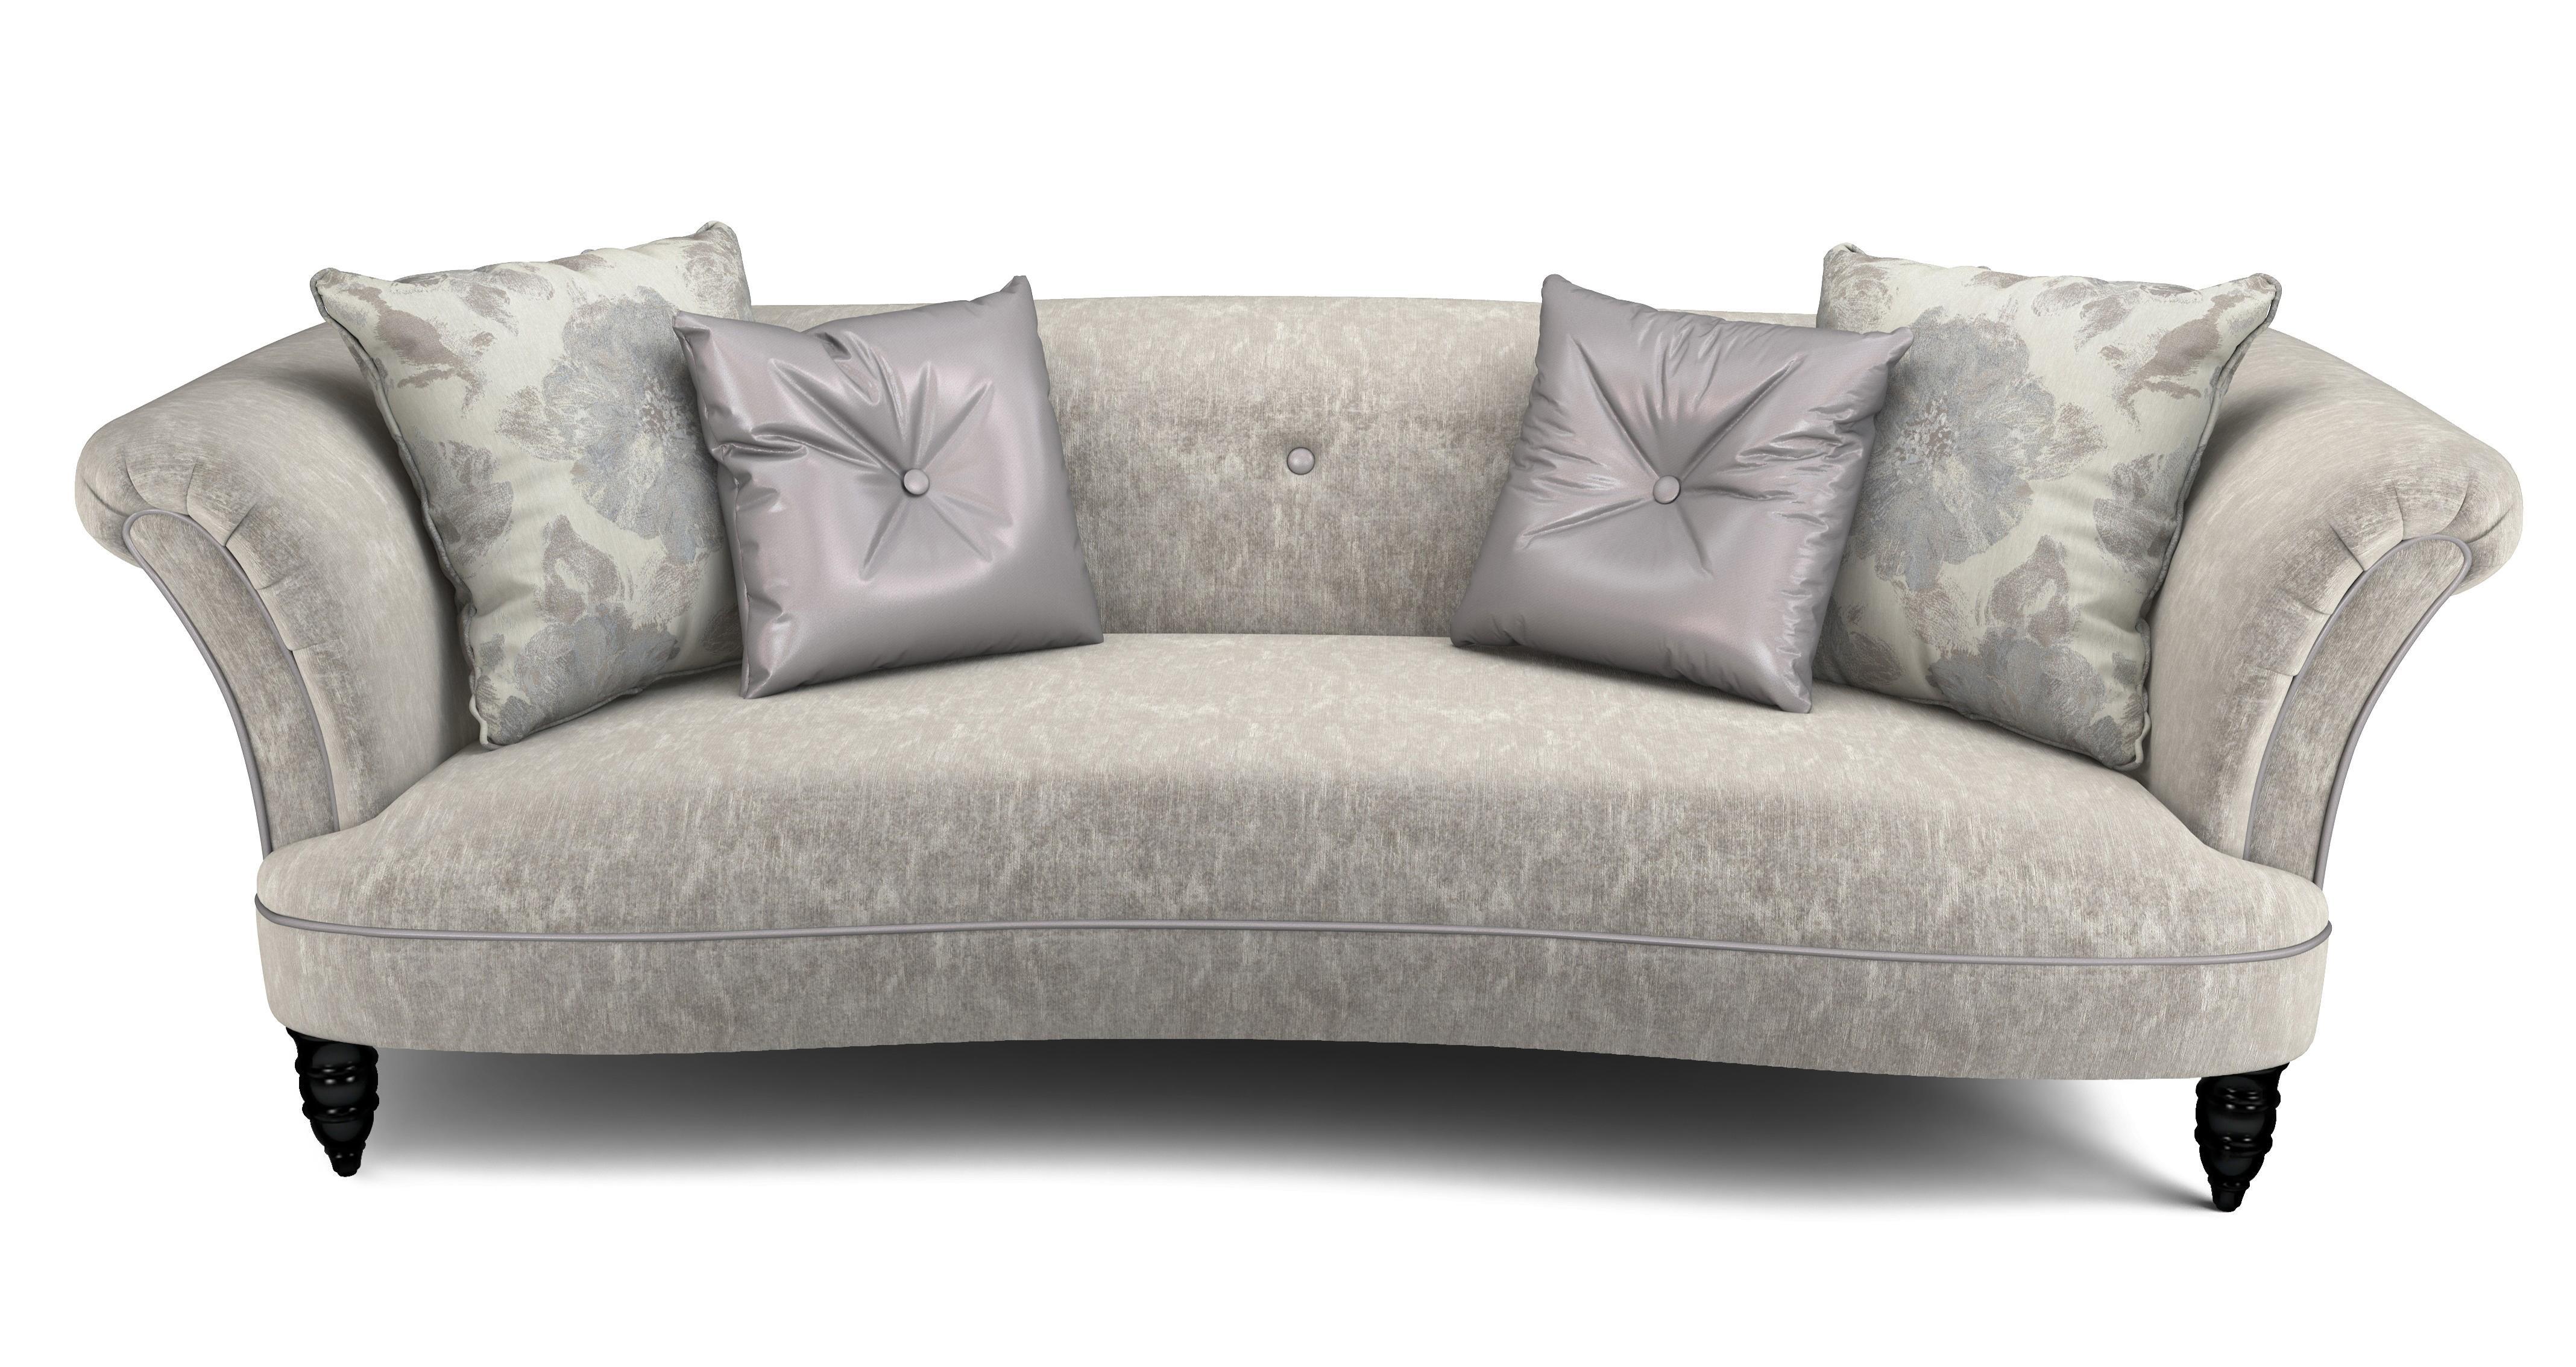 Concerto 4 Seater Sofa DFS